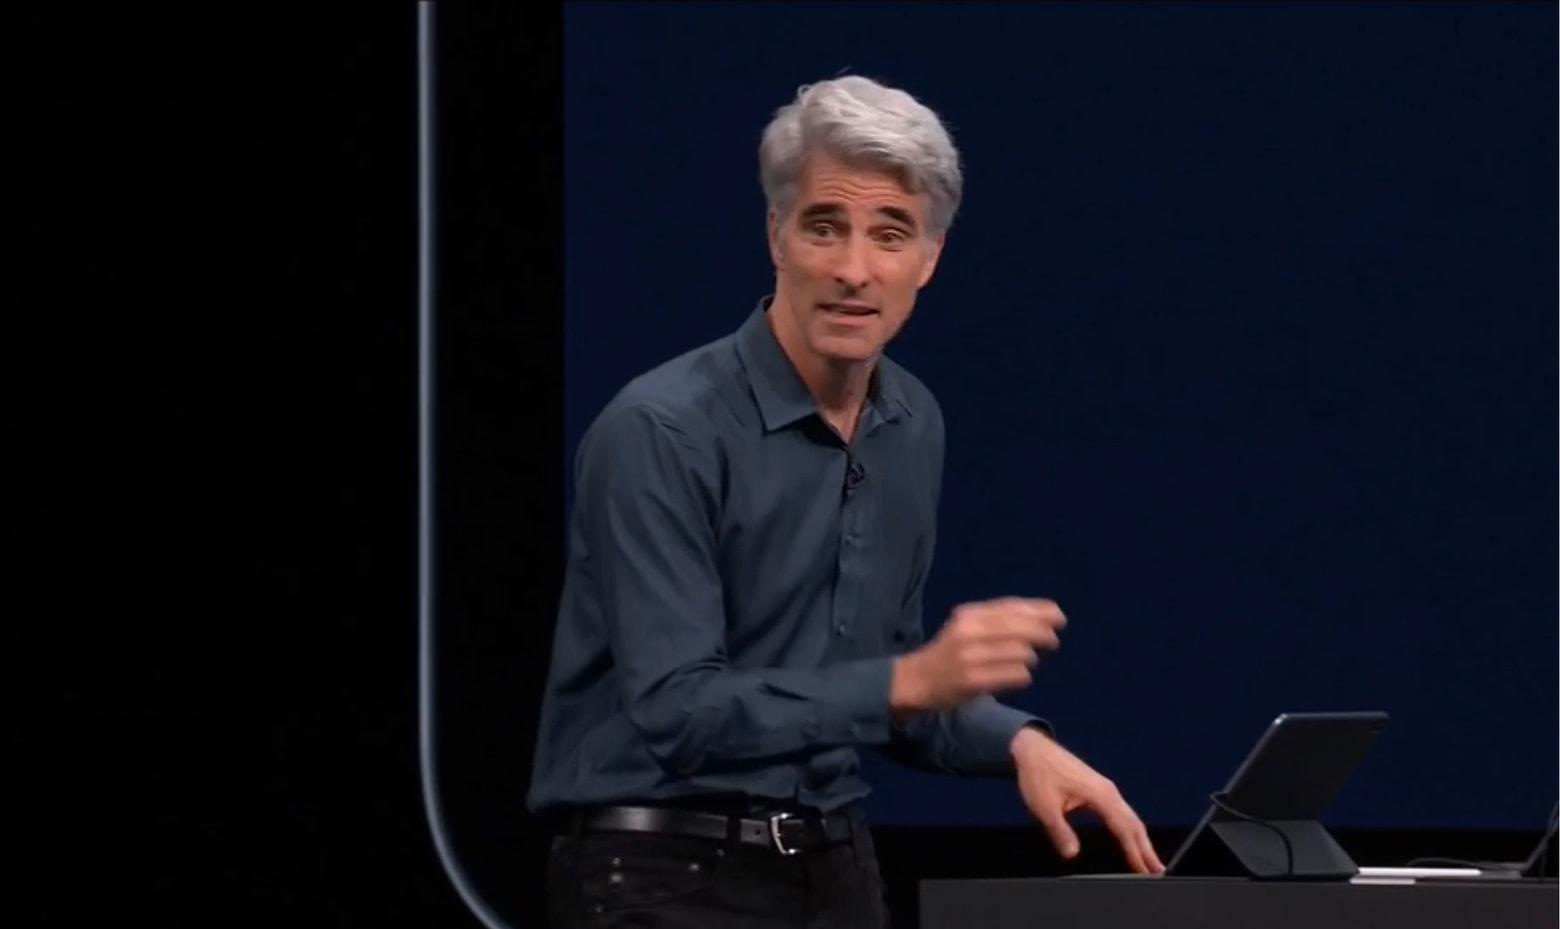 Craig Federighi Apple SVP of Software Engineering